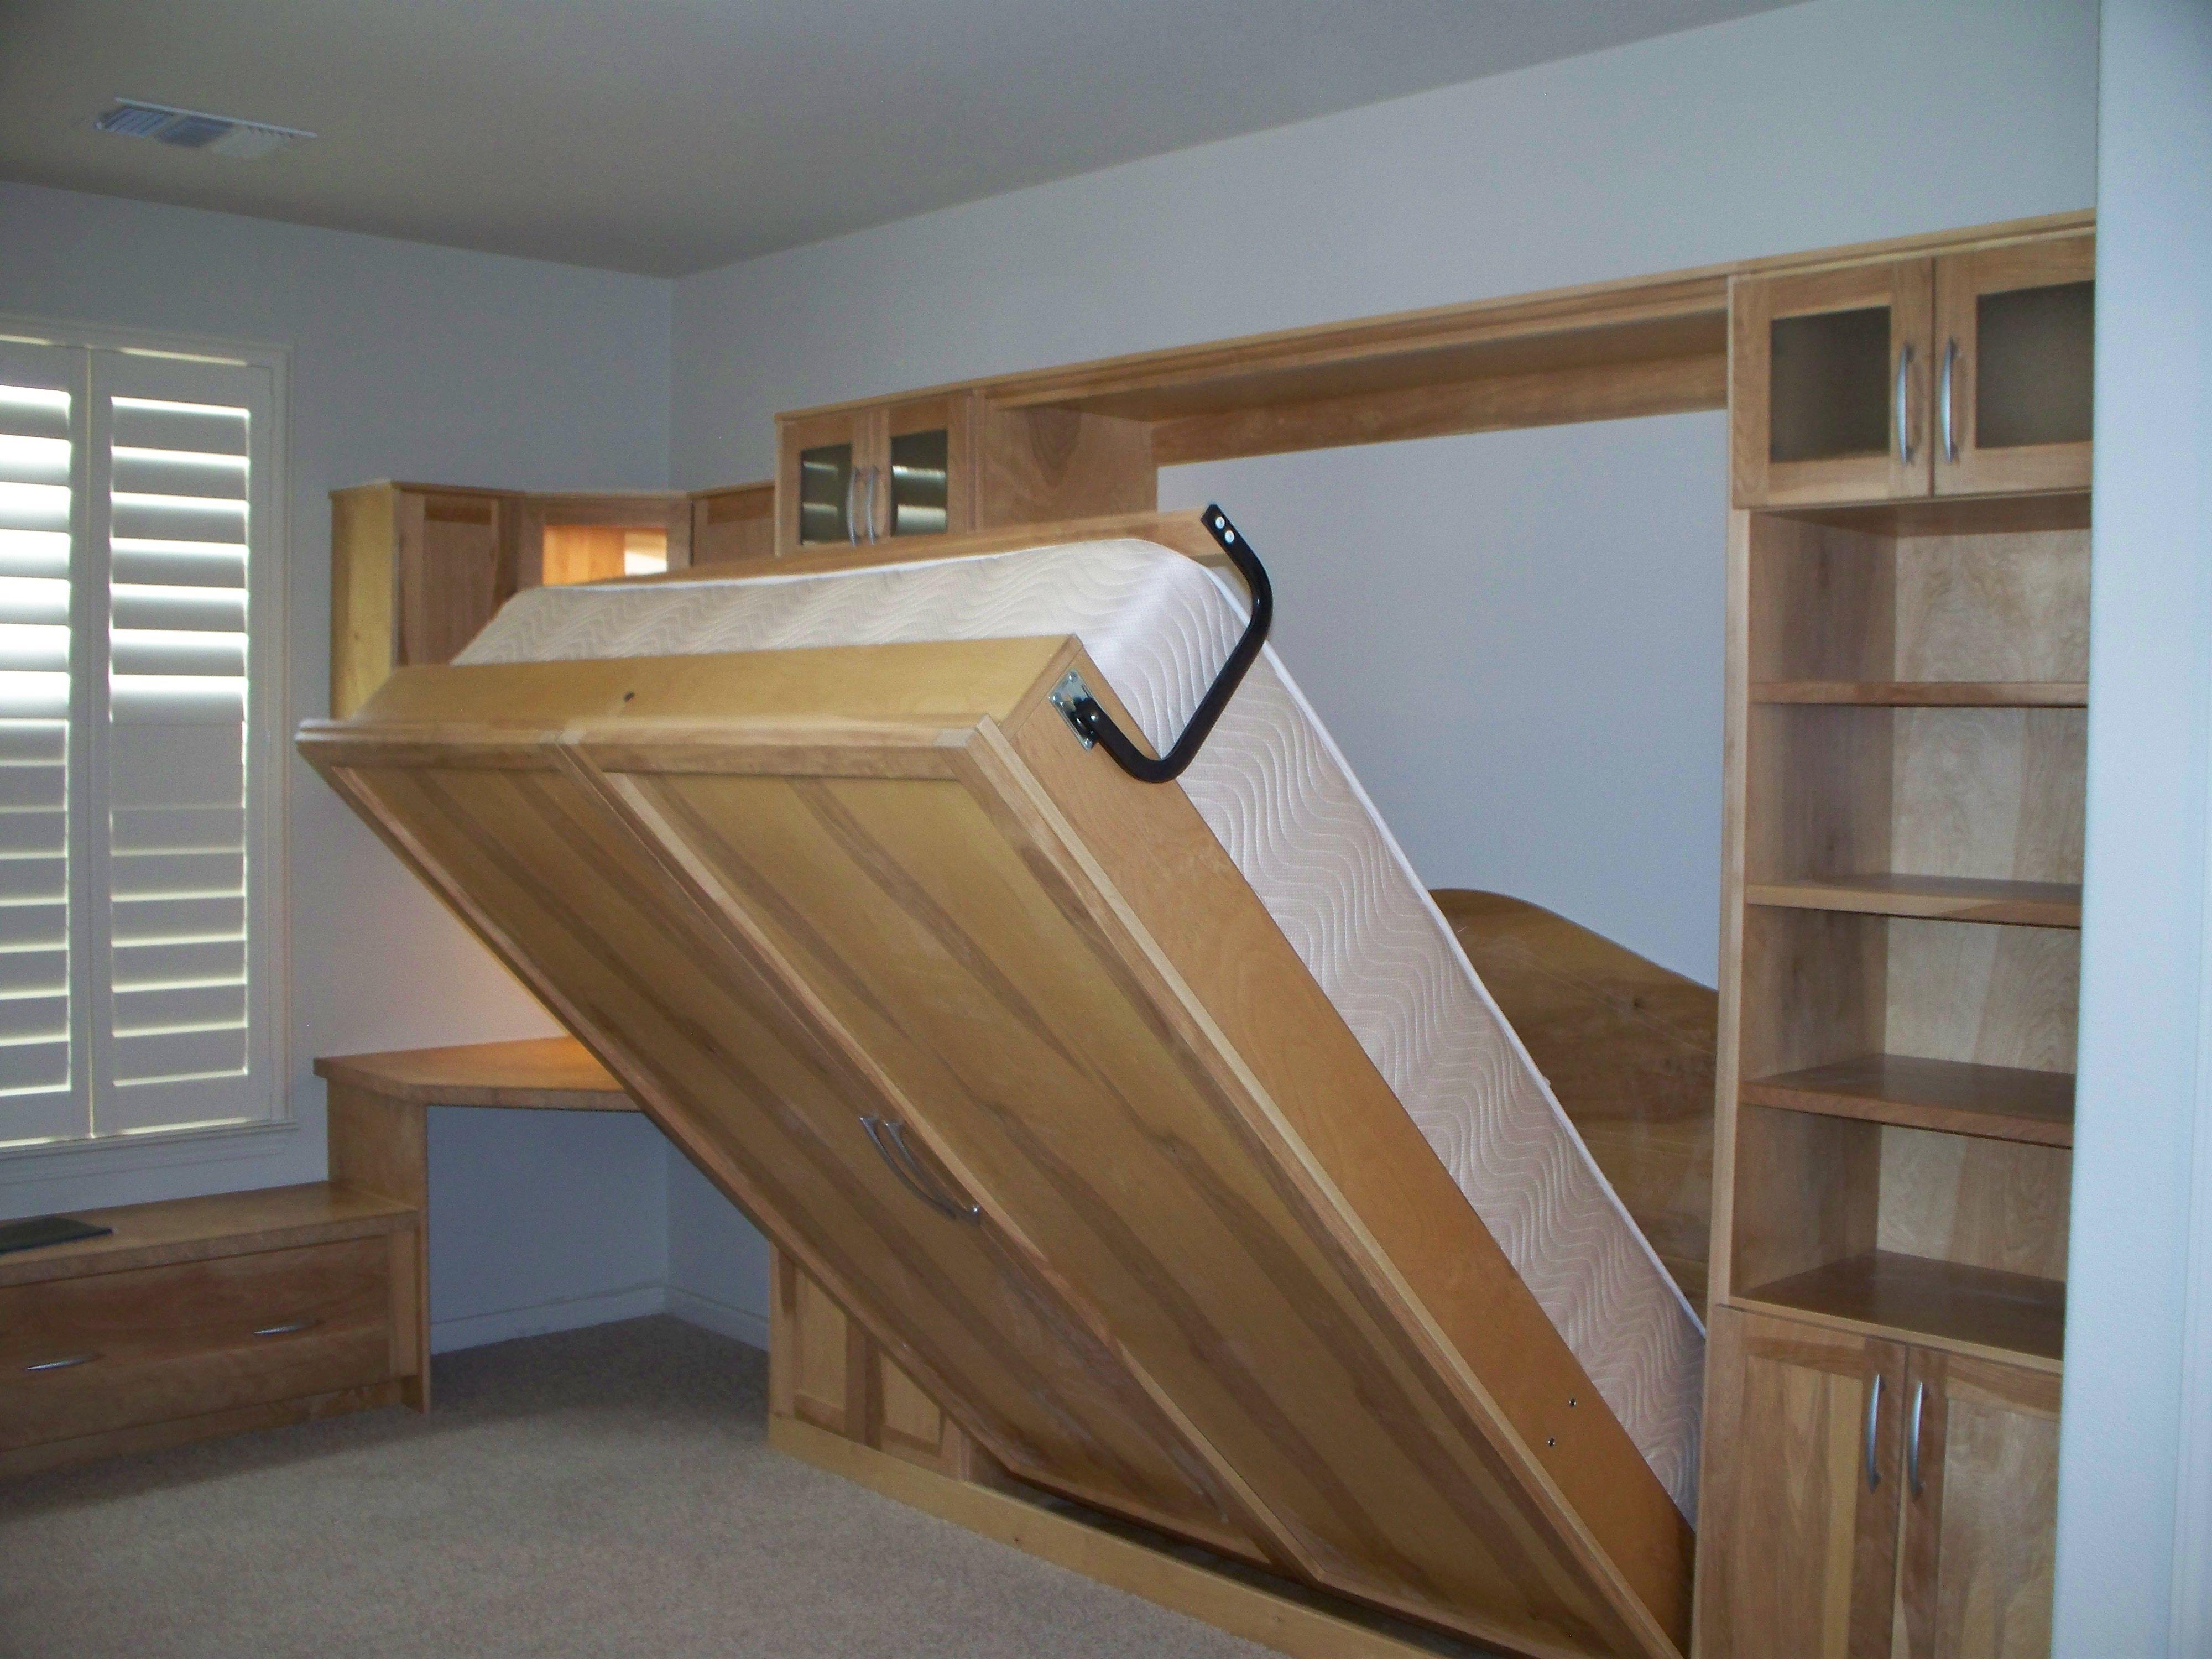 - Sauce_011.jpg 4,000×3,000 Pixels Fold Up Wall Bed, Murphy Bed